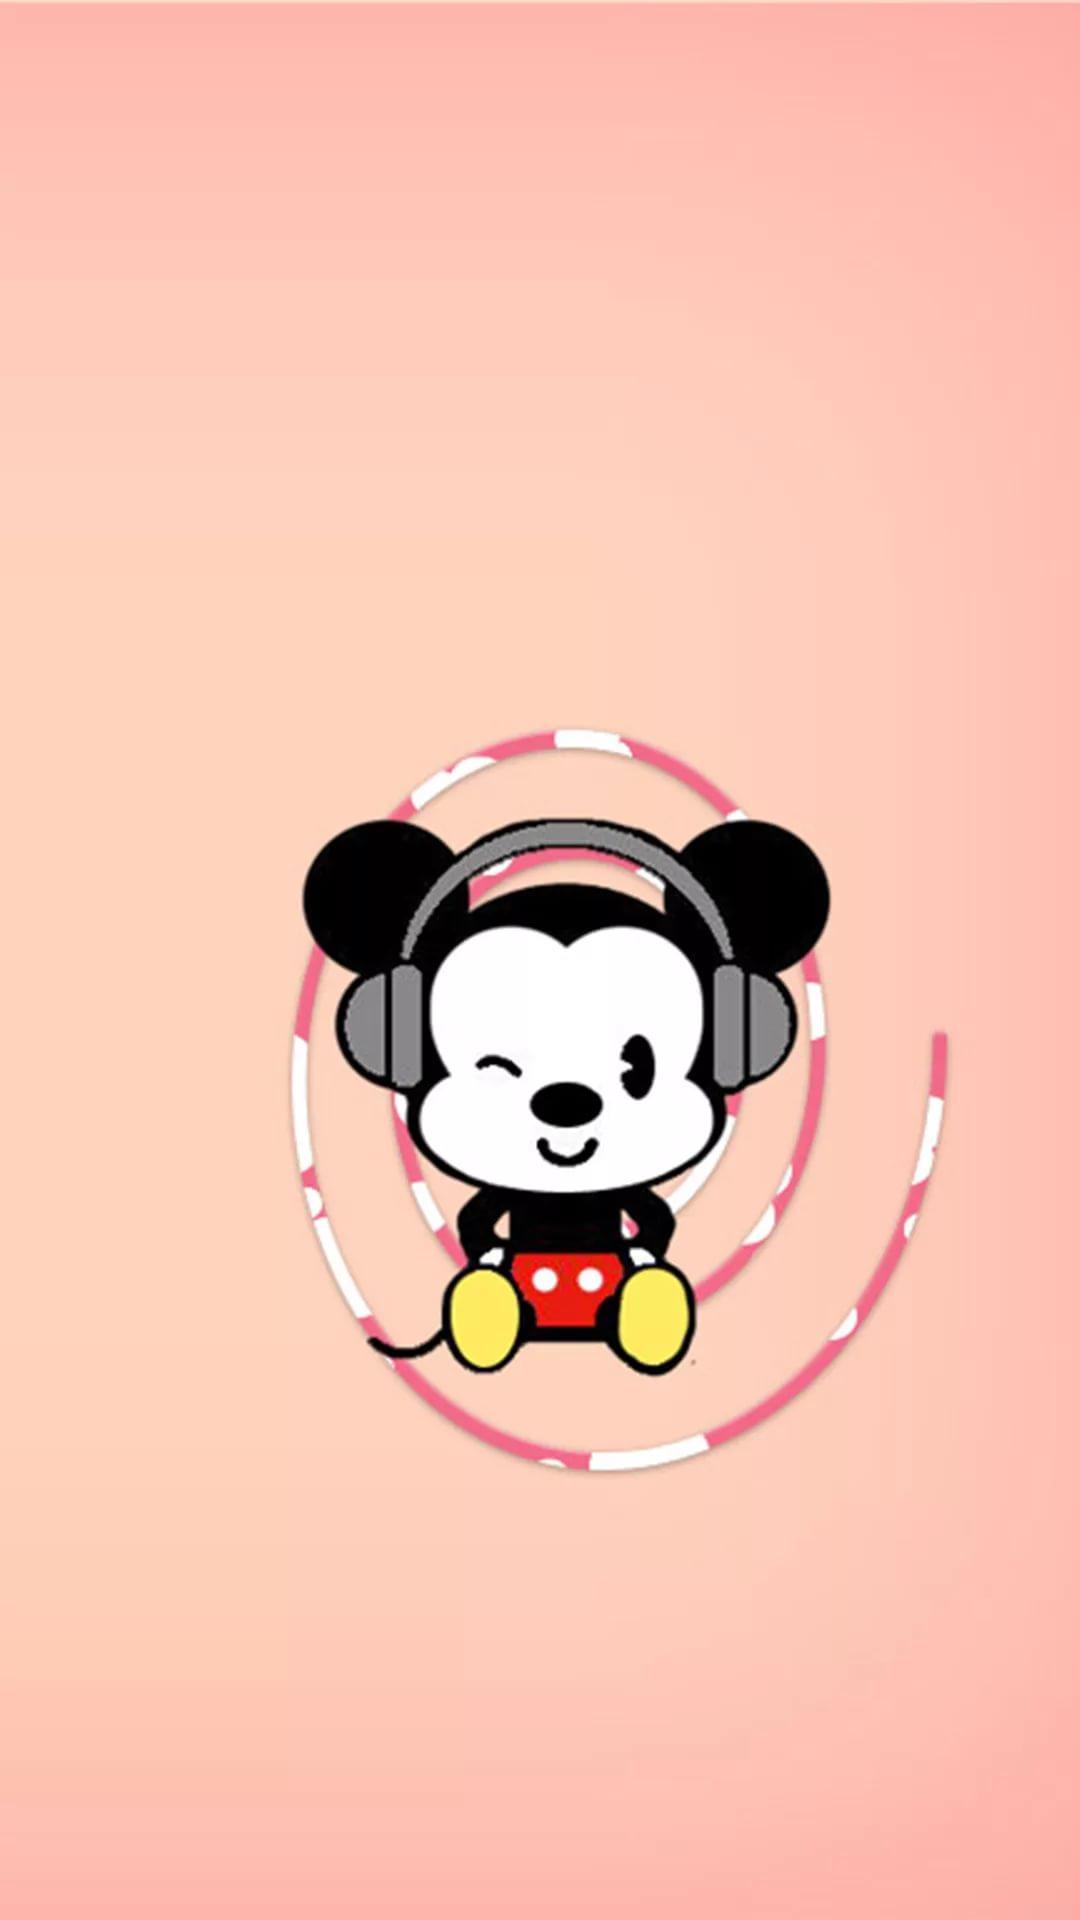 Cute phone background